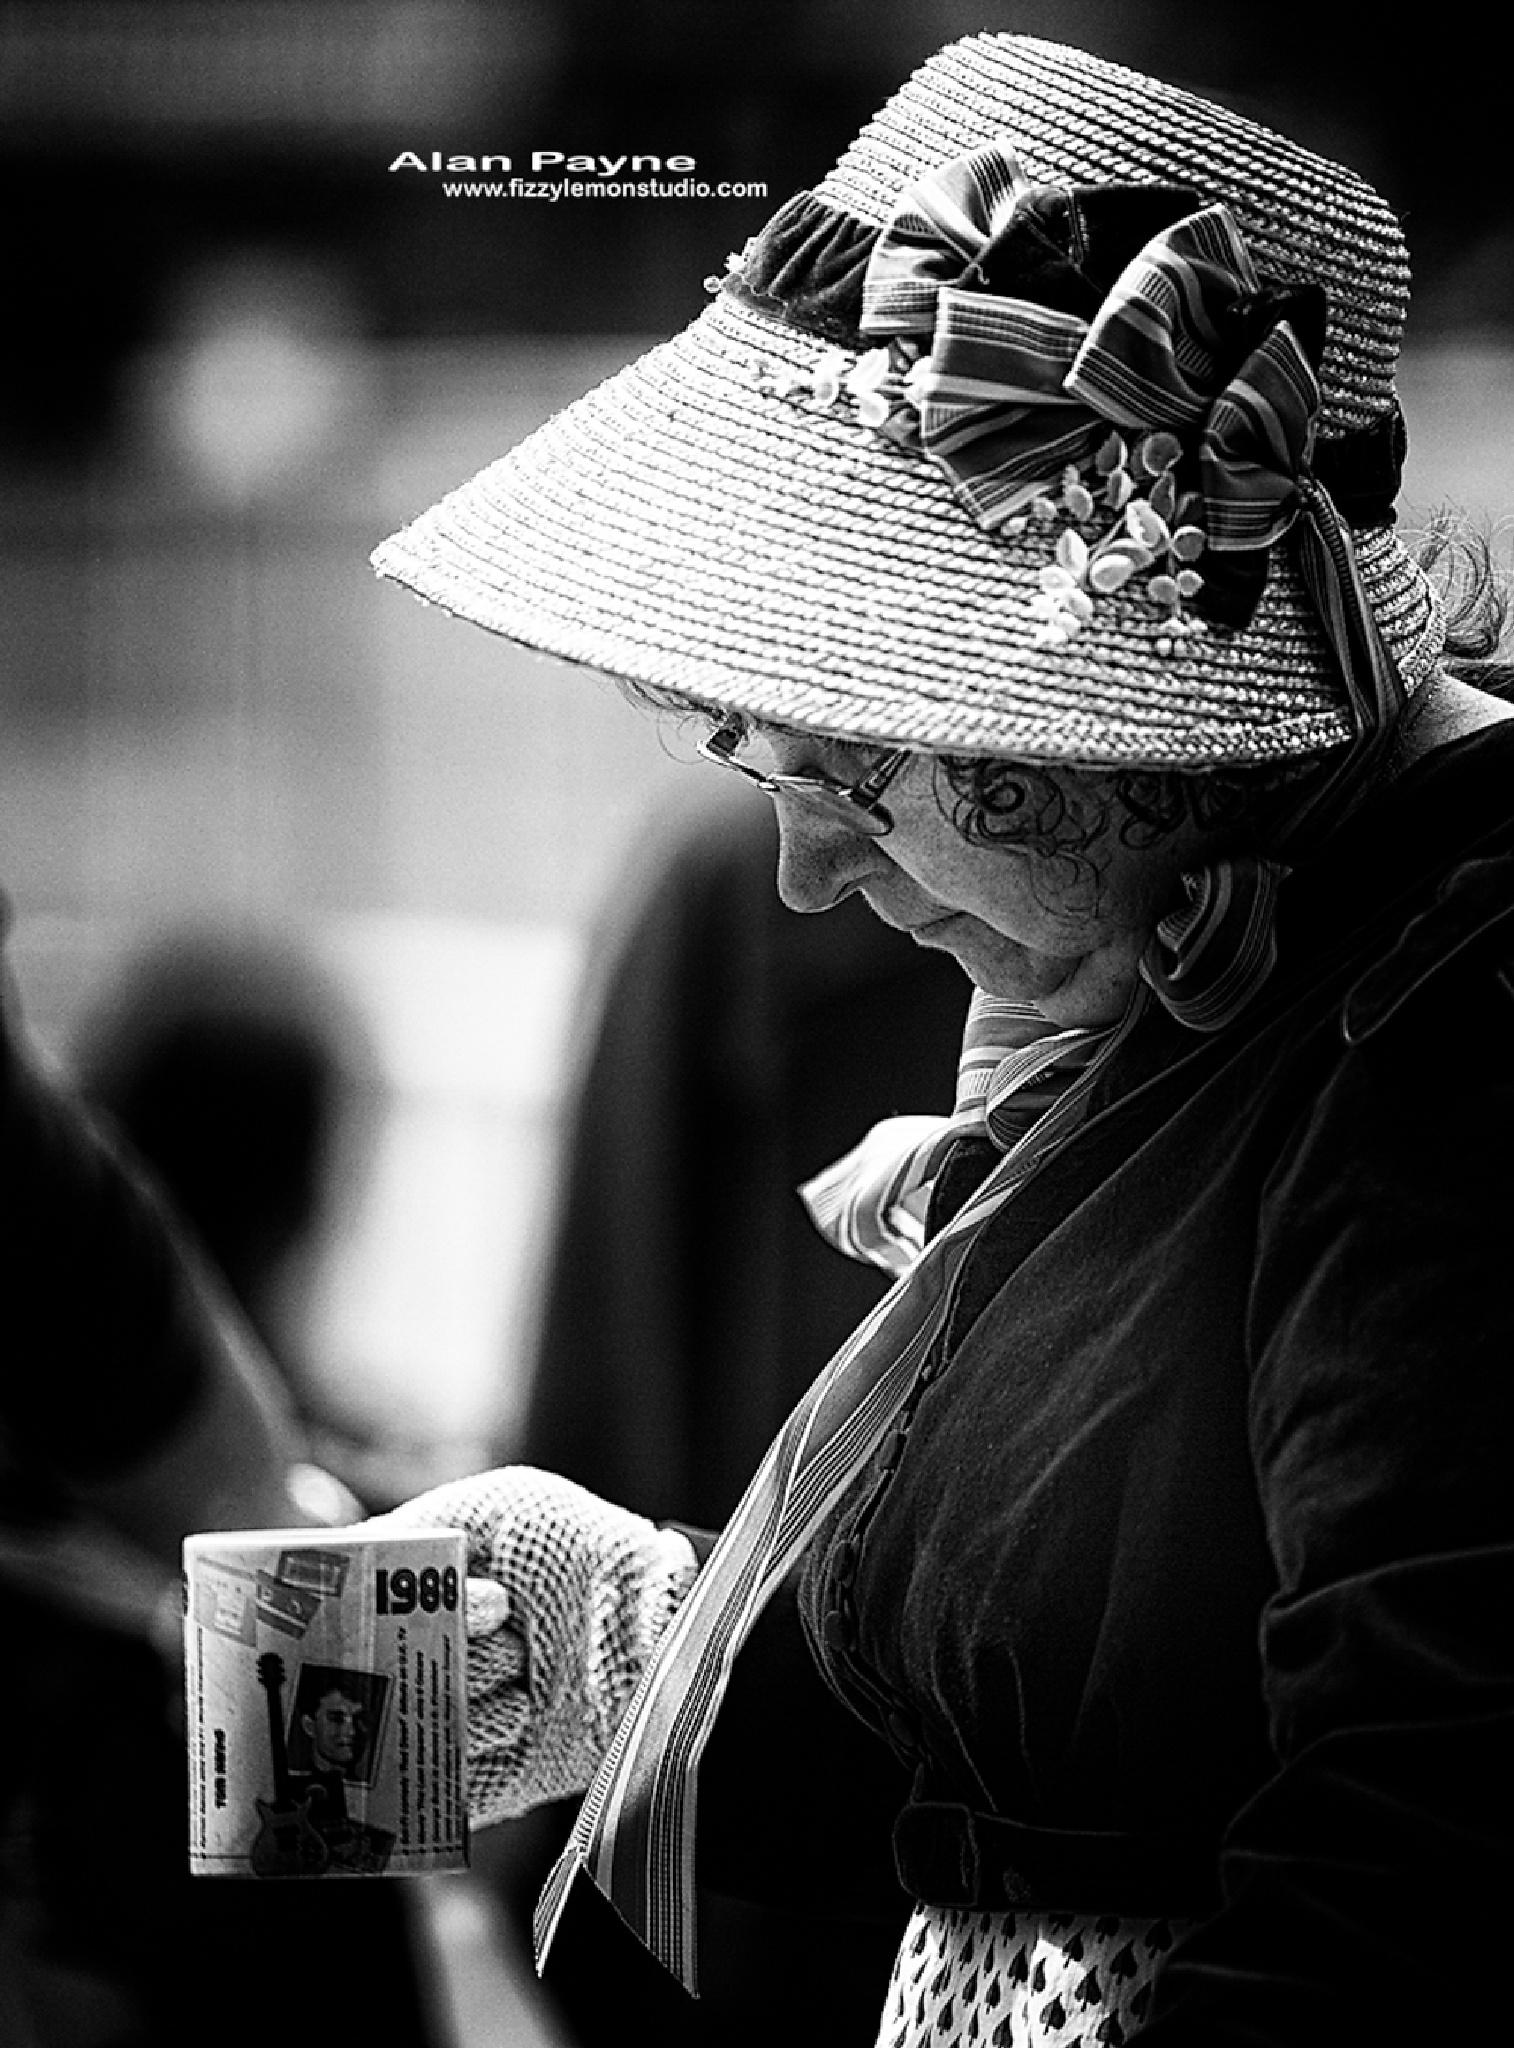 Nice cup of tea by alanpayne_fizzylemonstudio